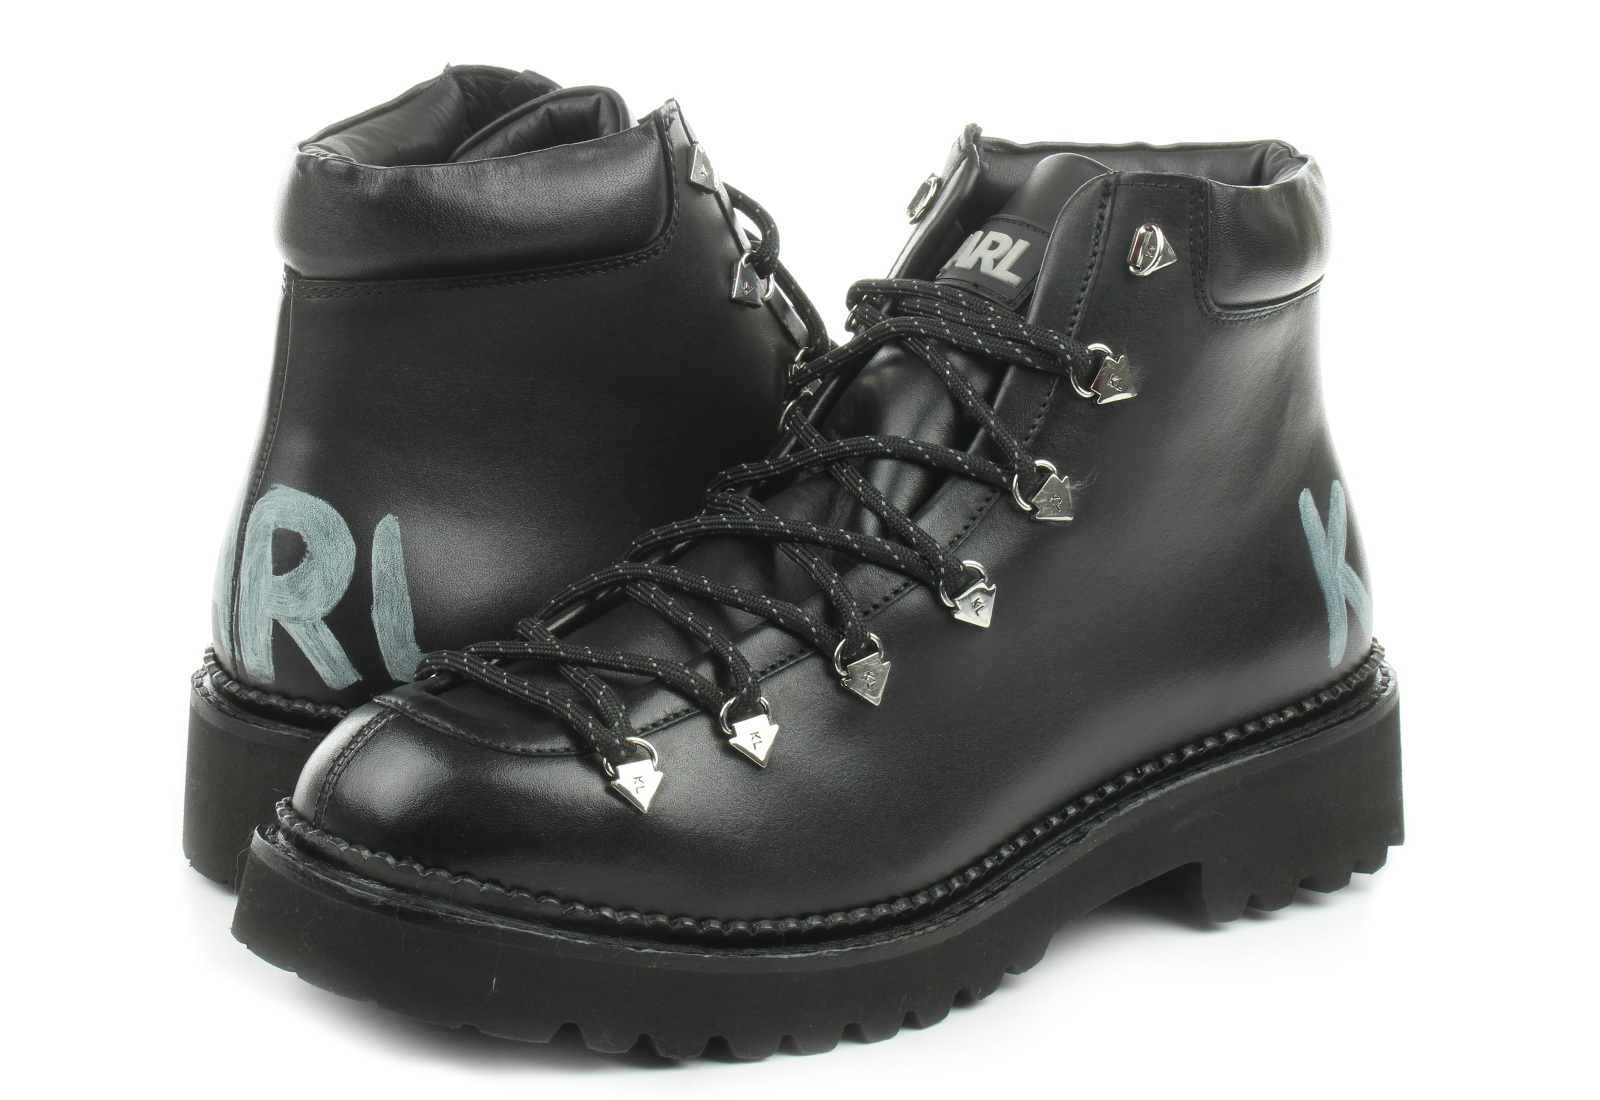 Karl Lagerfeld Bakancs Kadet Ii Hiker Boot